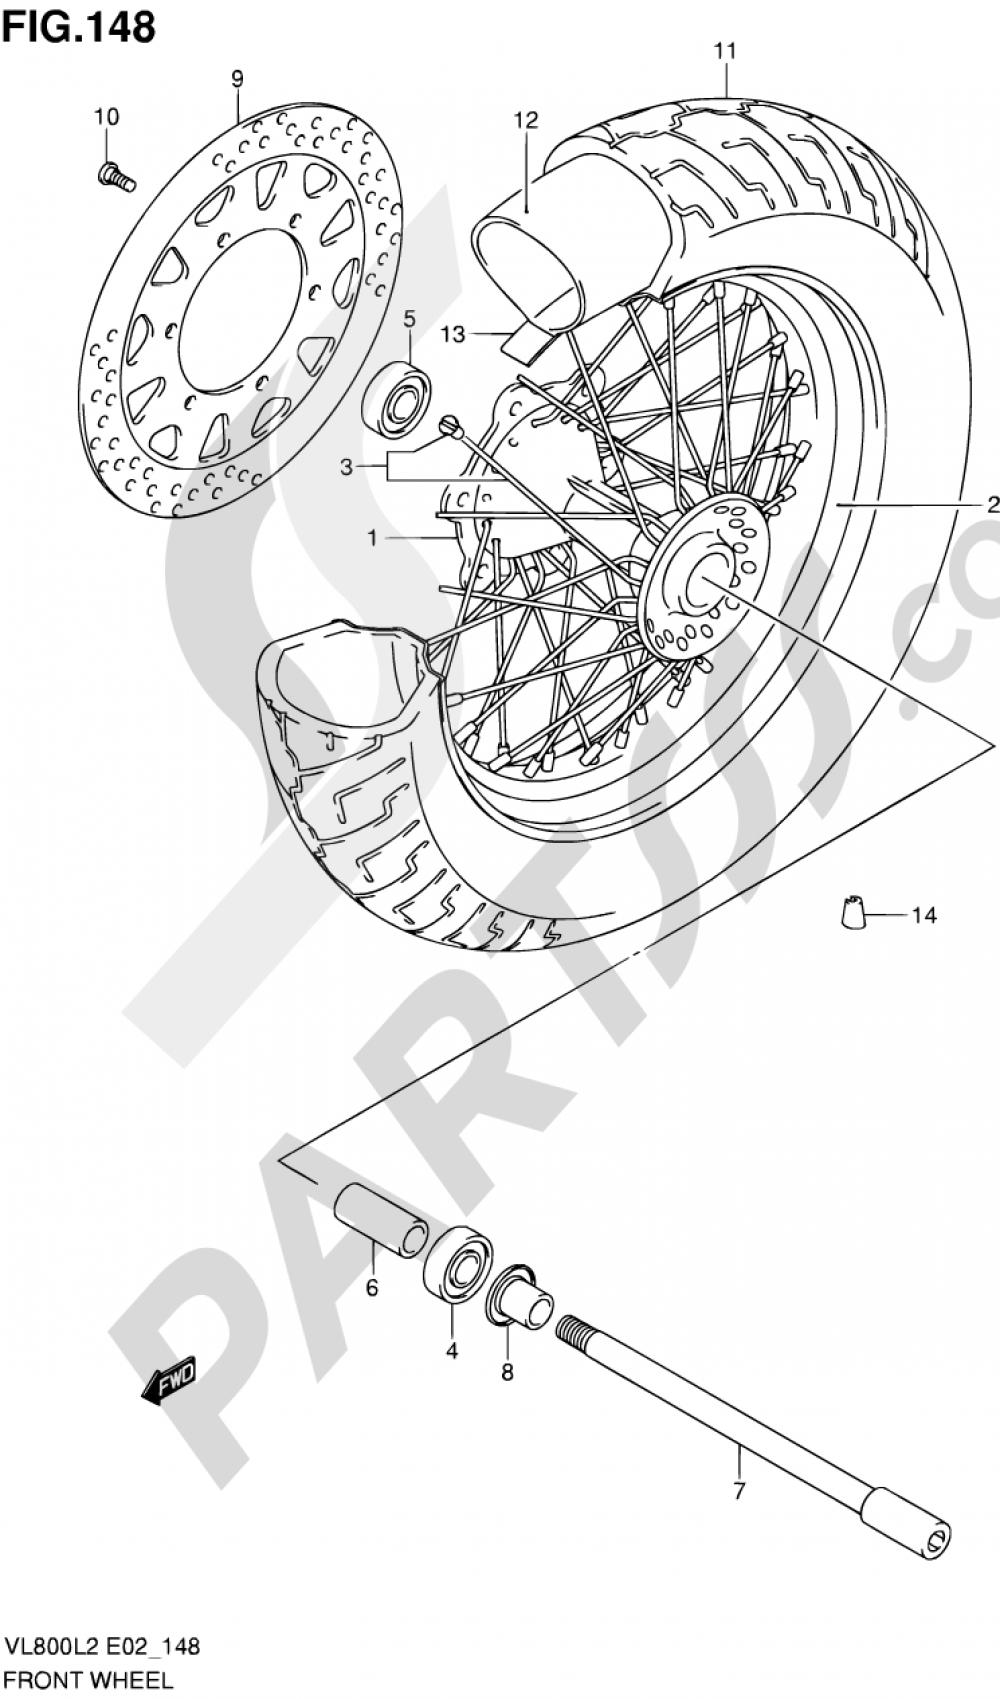 148 - FRONT WHEEL (VL800L2 E02) Suzuki INTRUDER VL800 2012